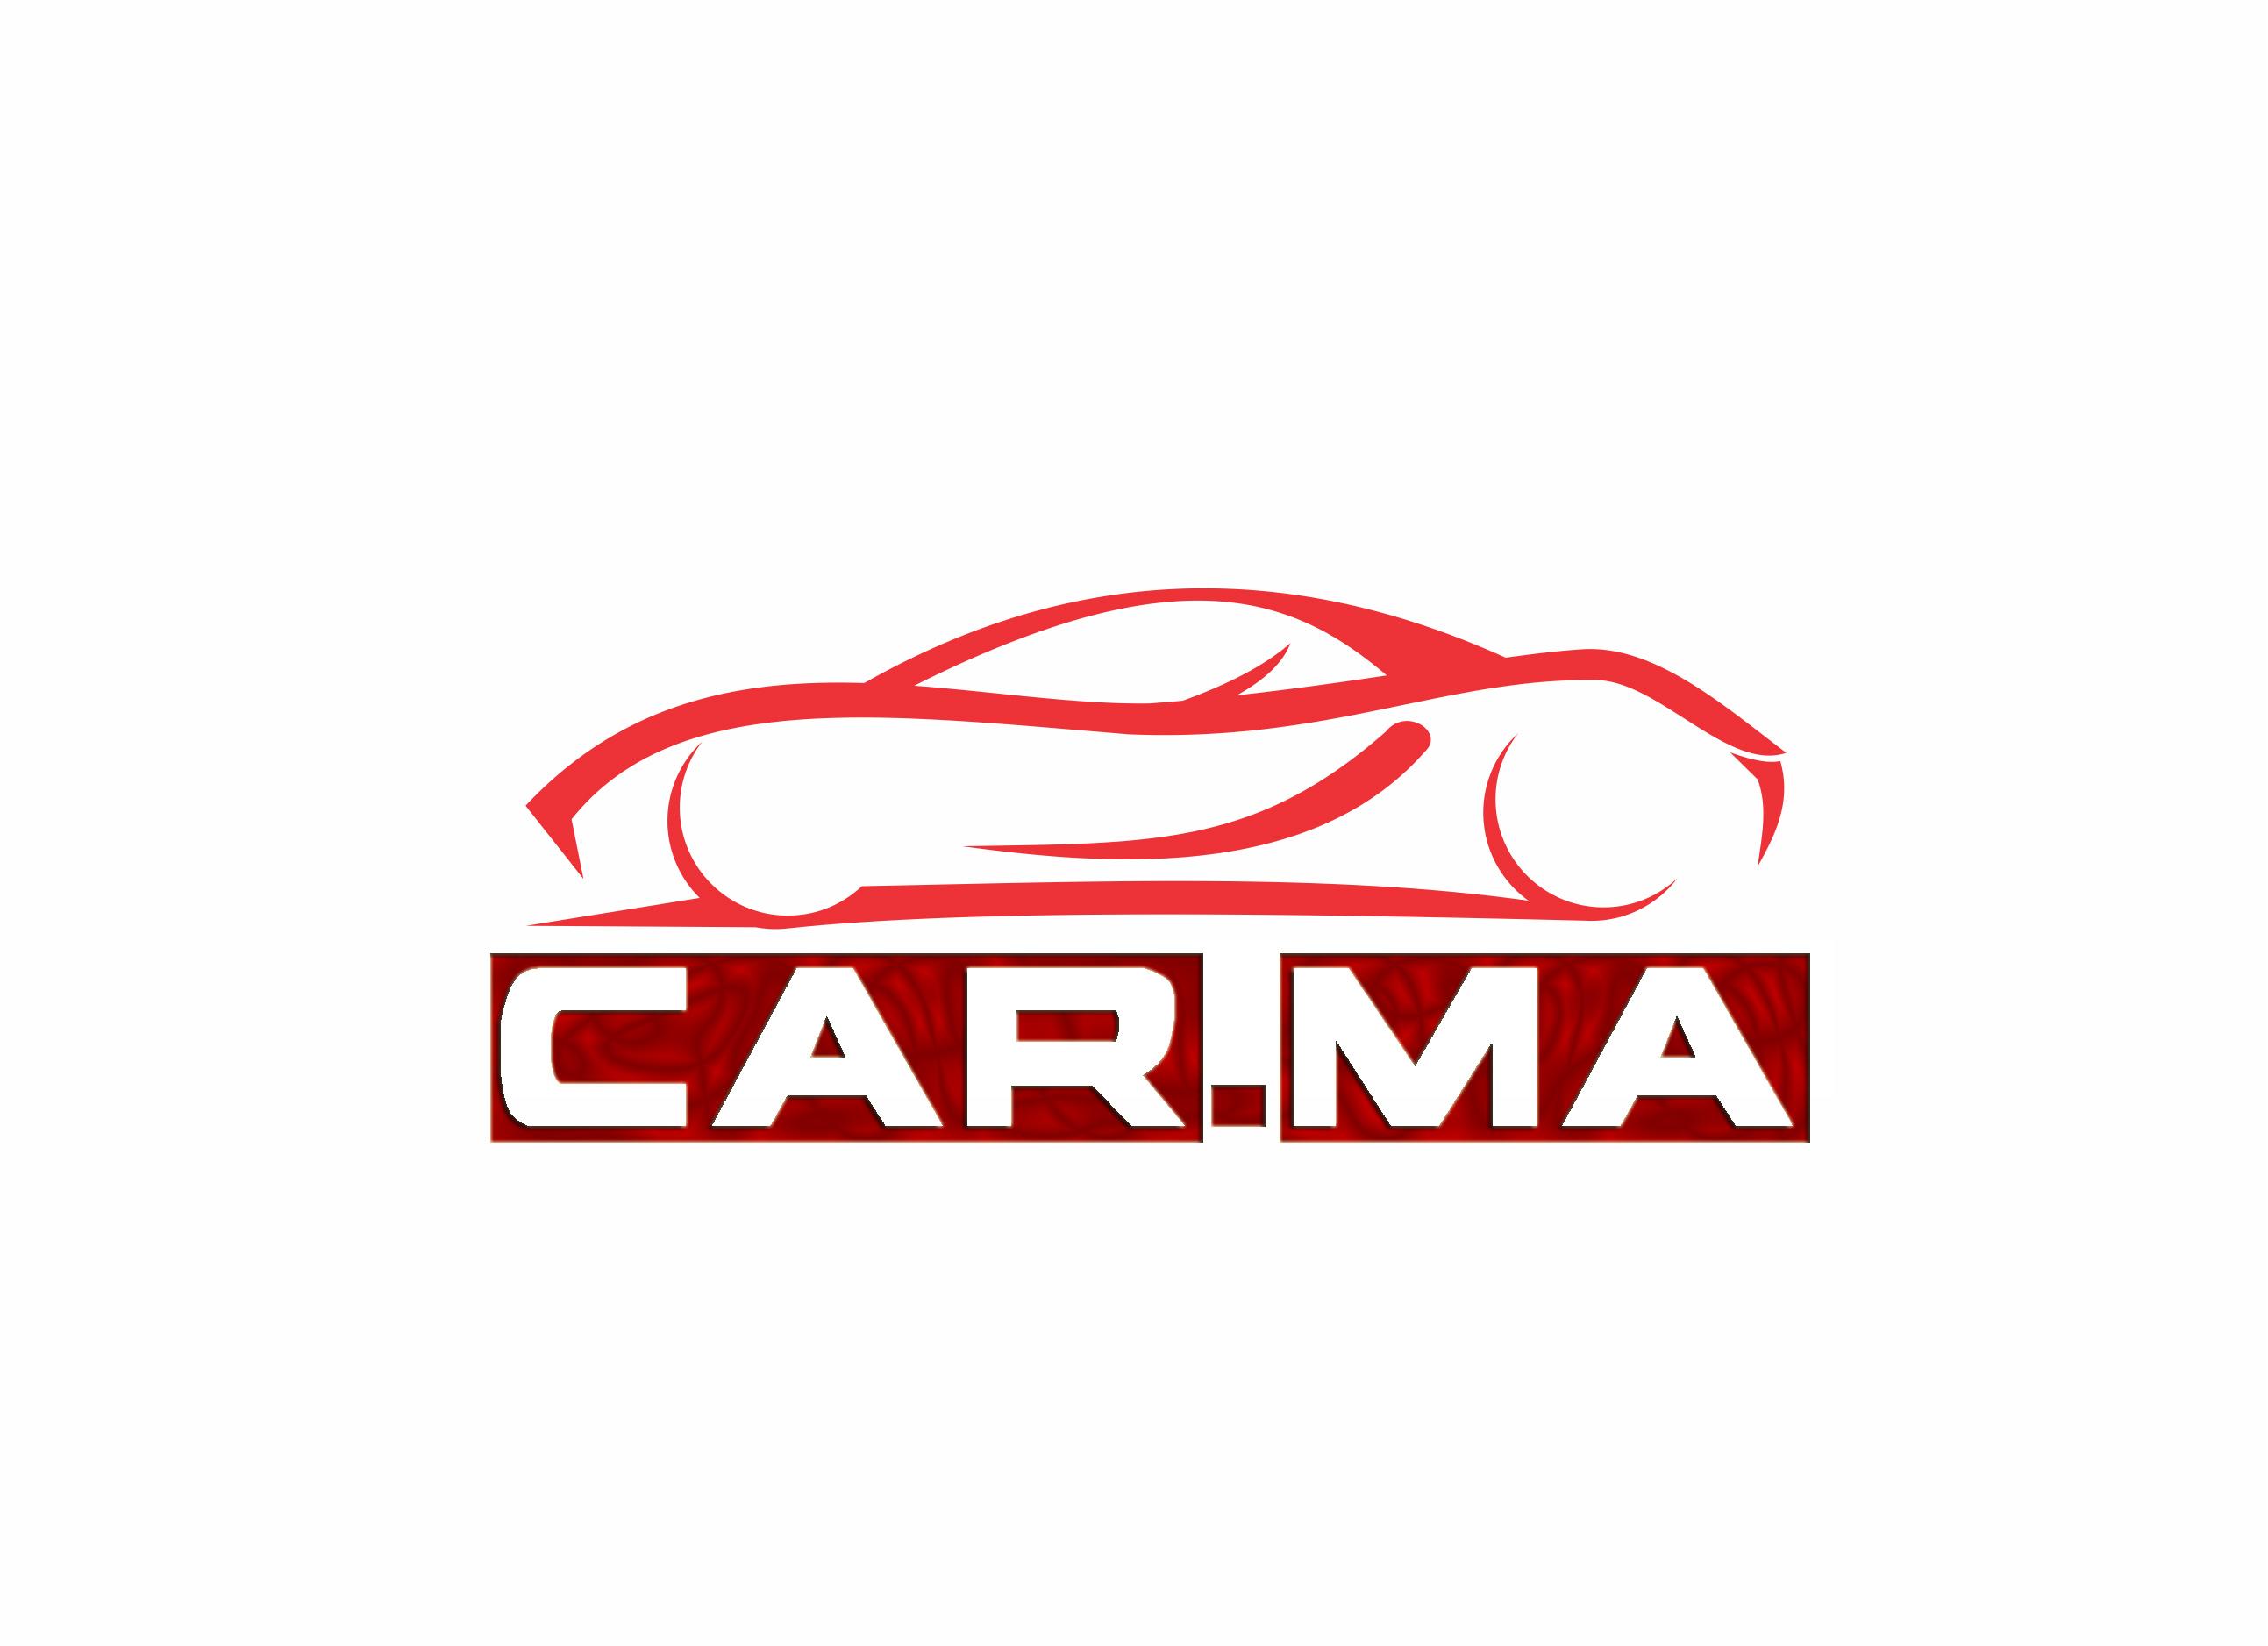 New Logo Design for car.ma | HiretheWorld